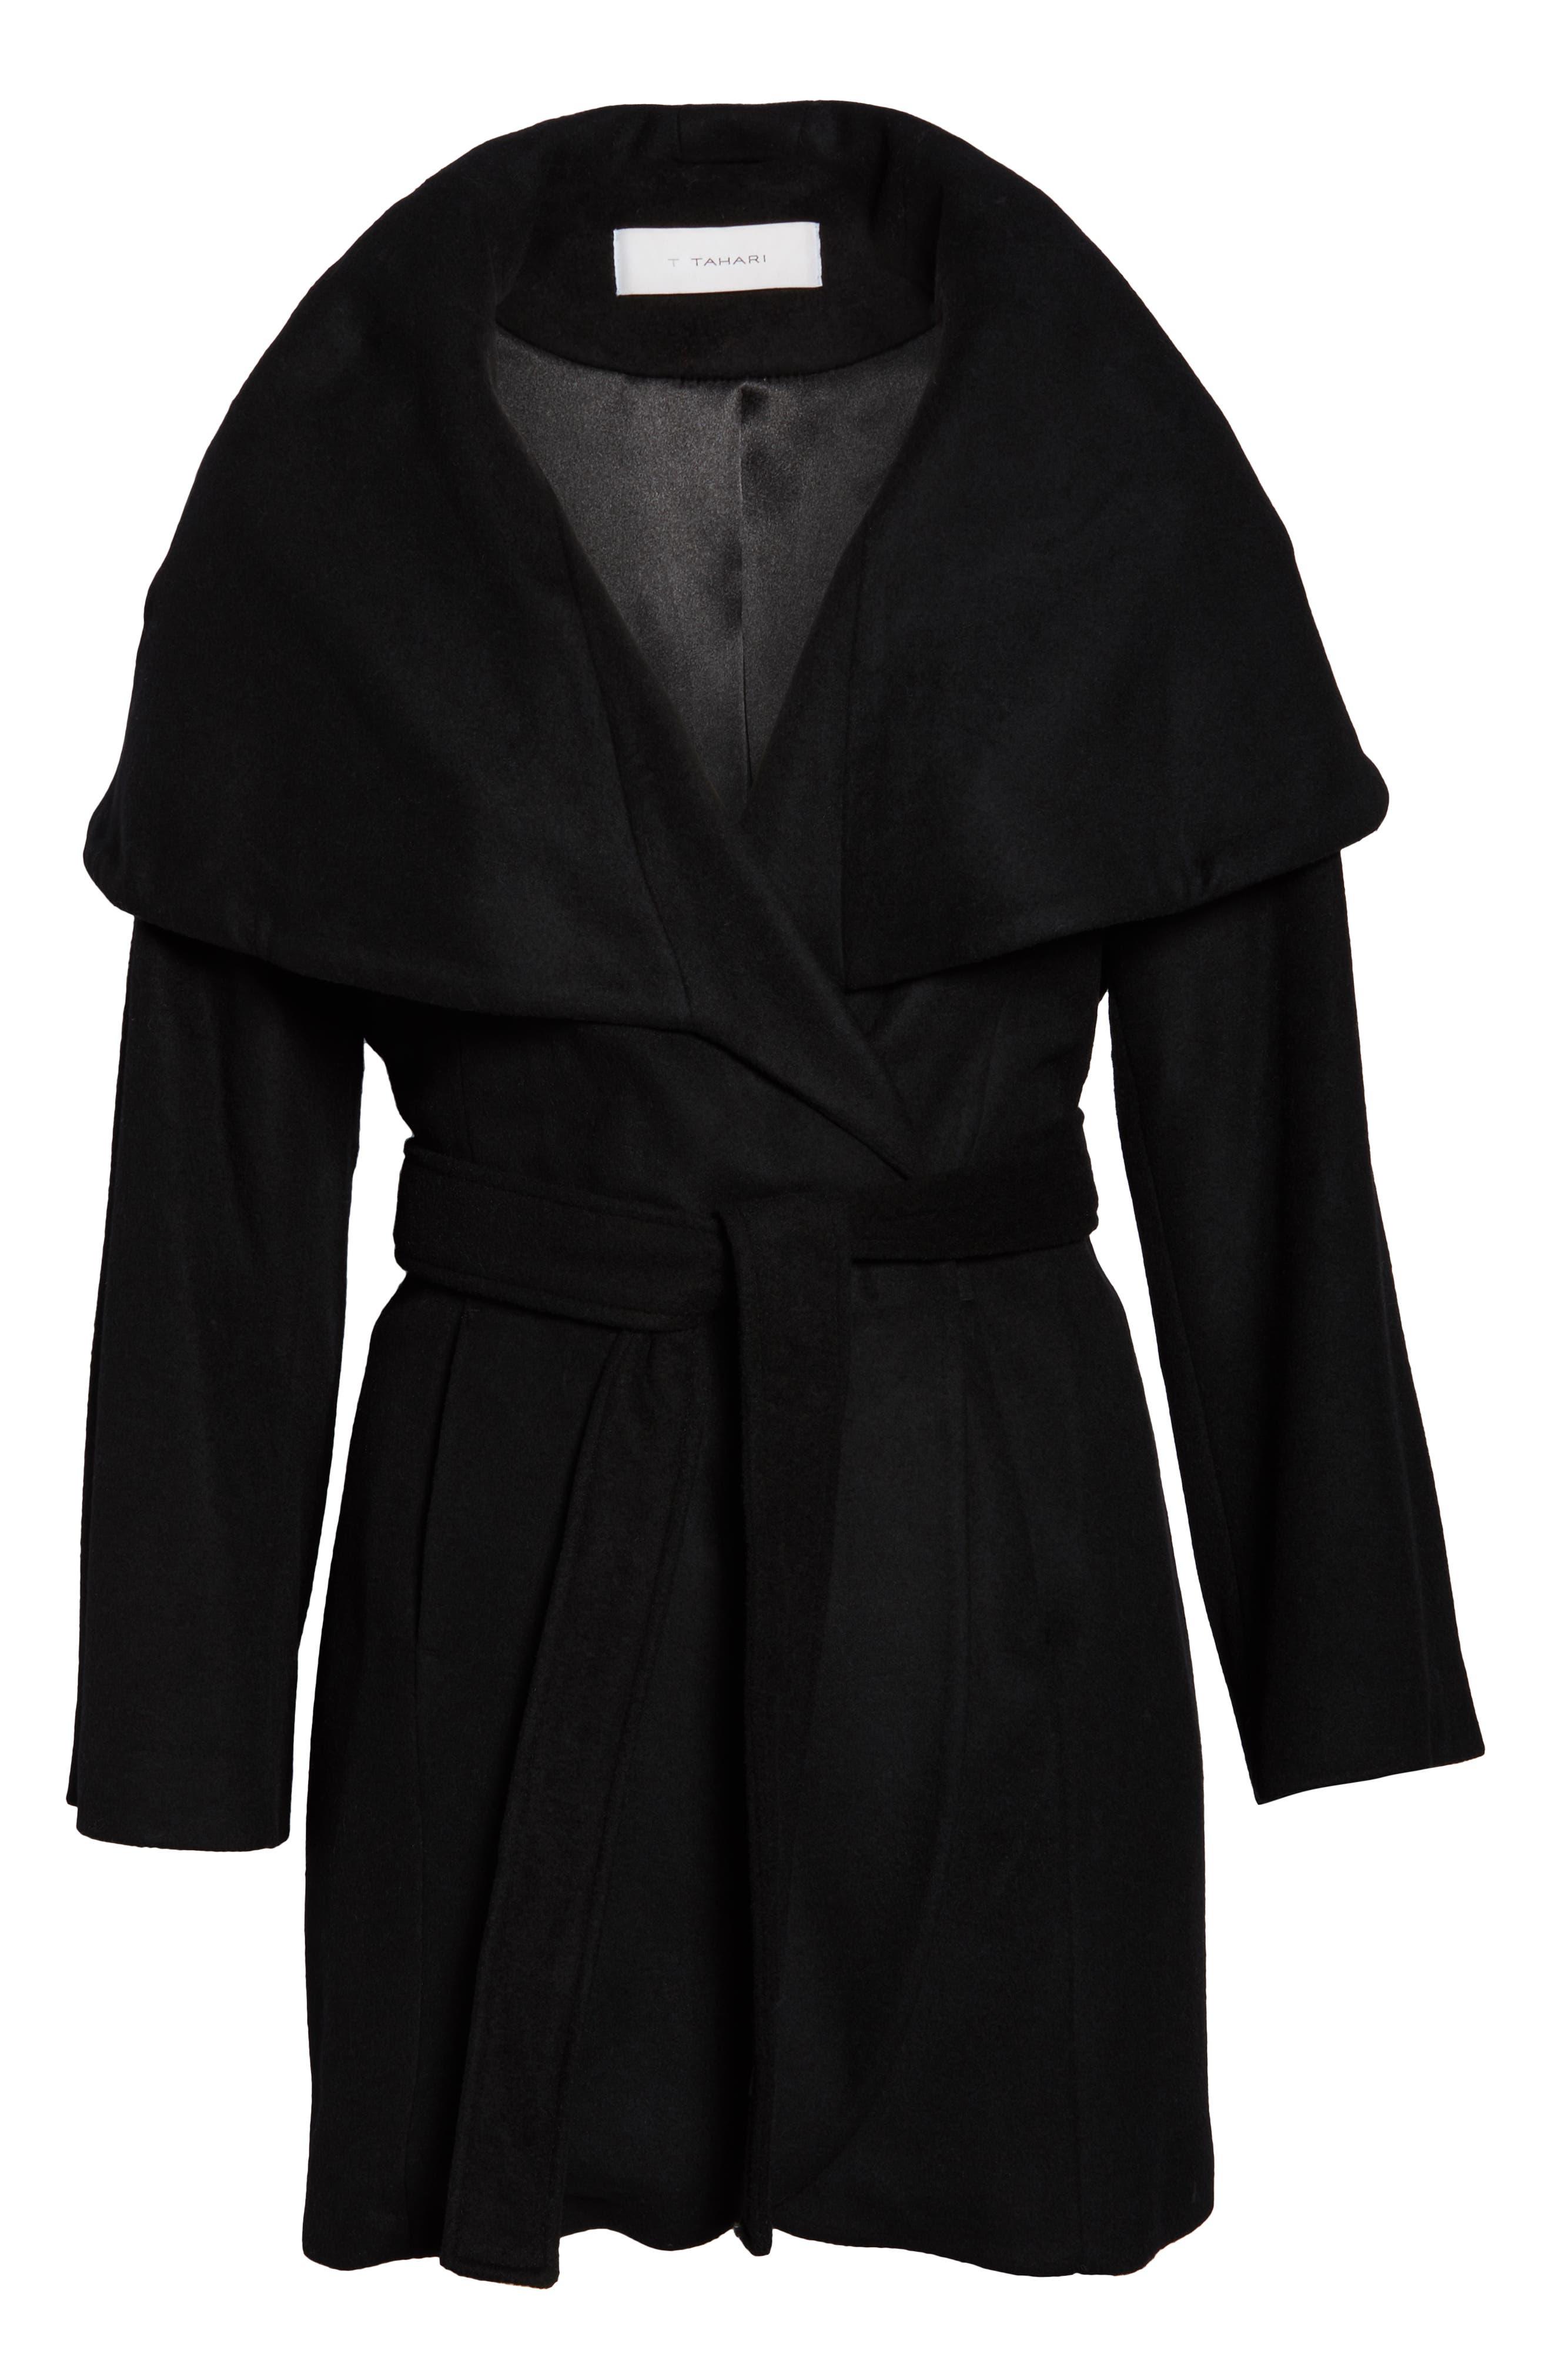 Marla Cutaway Wrap Coat with Oversize Collar,                             Alternate thumbnail 6, color,                             002